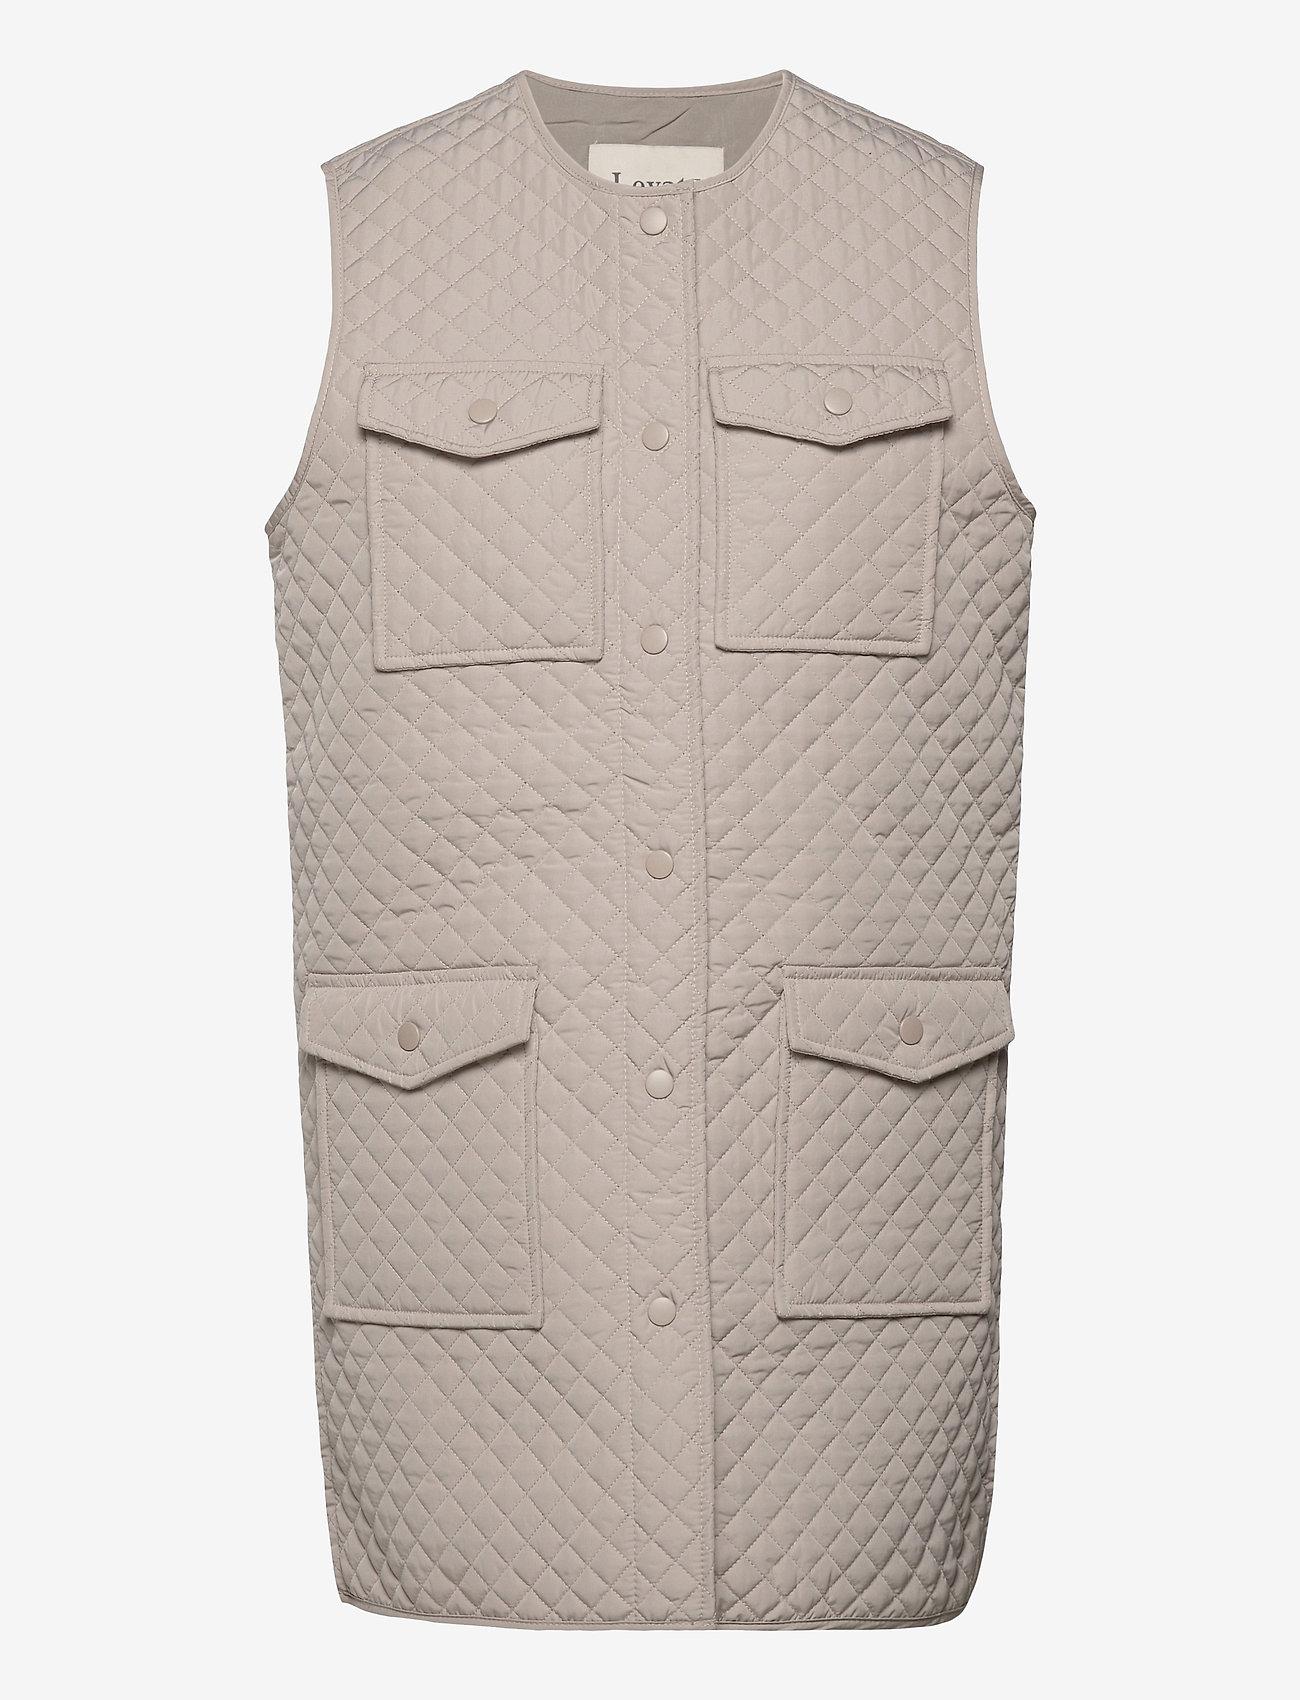 Levete Room - LR-MAGNOLIA - puffer vests - l901 - chateau gray - 0